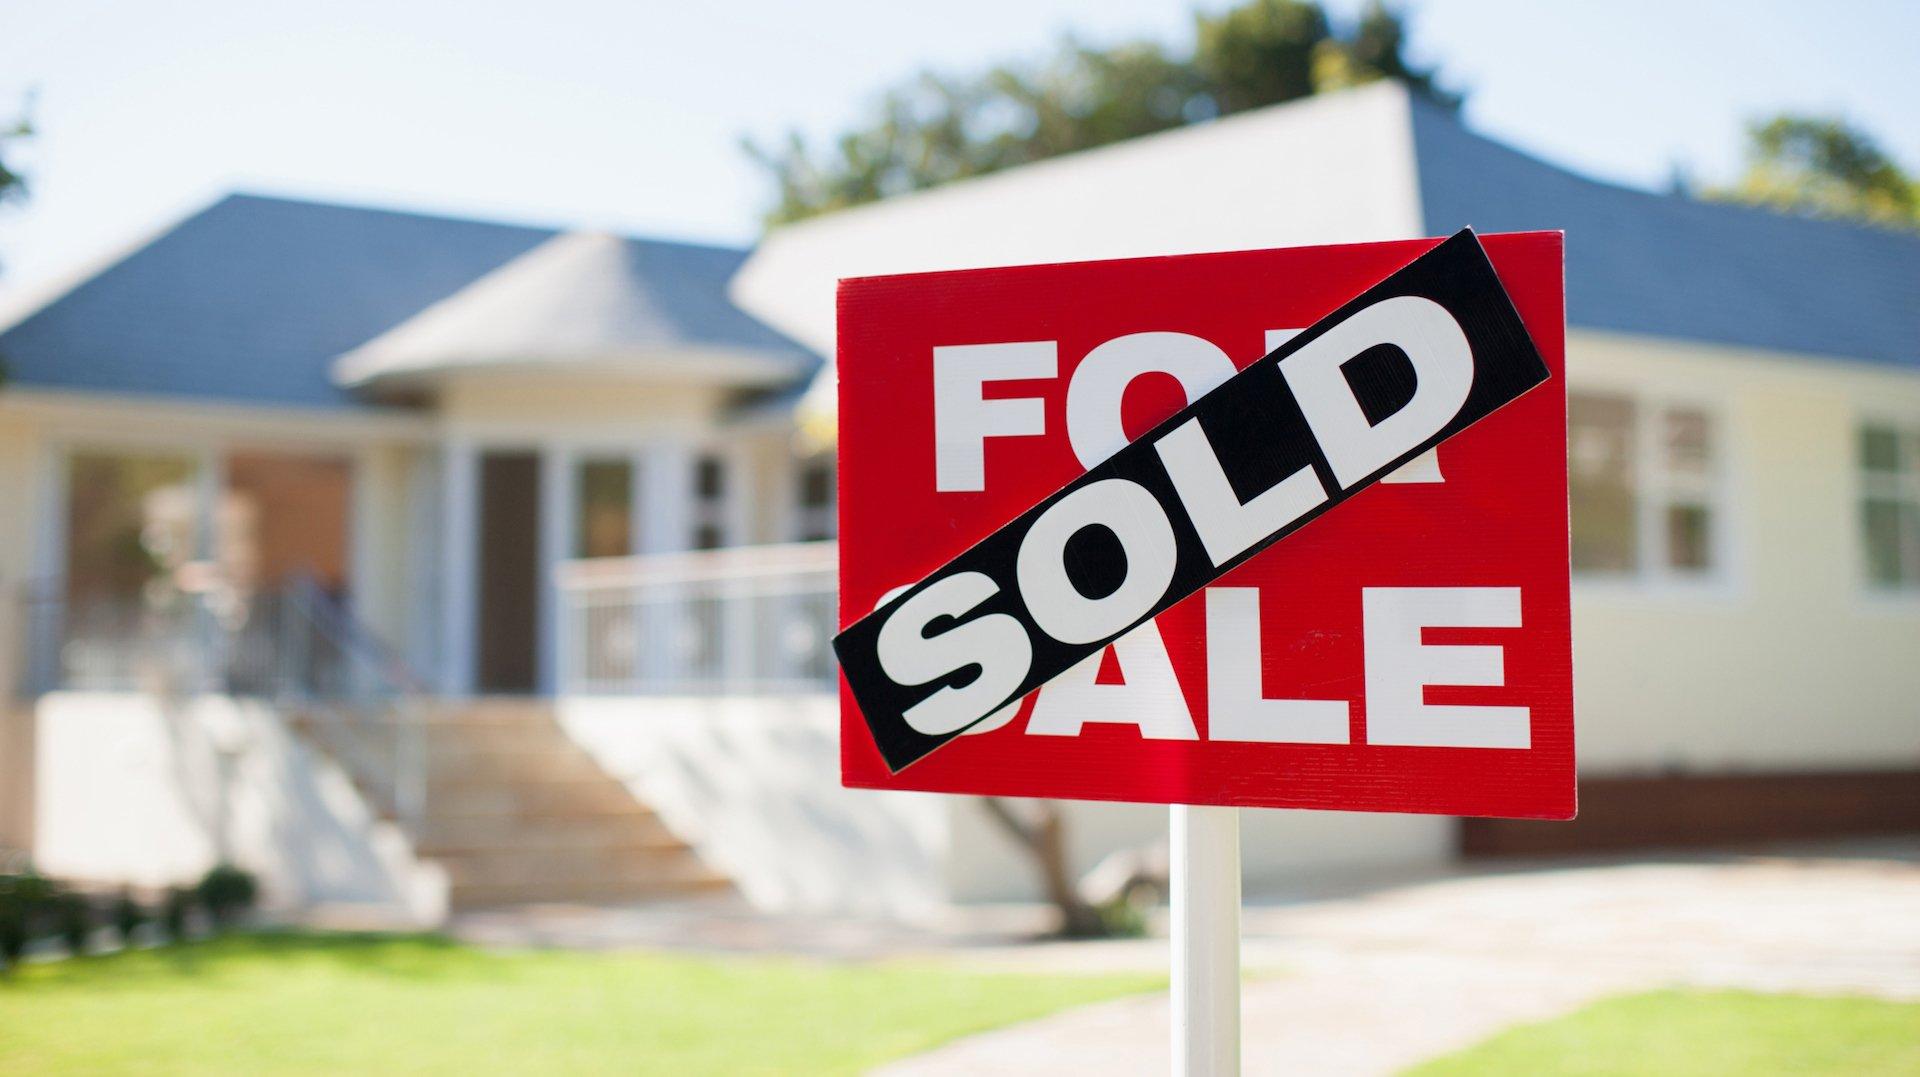 Selling Your Home Quickly in Cascade www.WeBuyHousesCascadeAtlanta.com